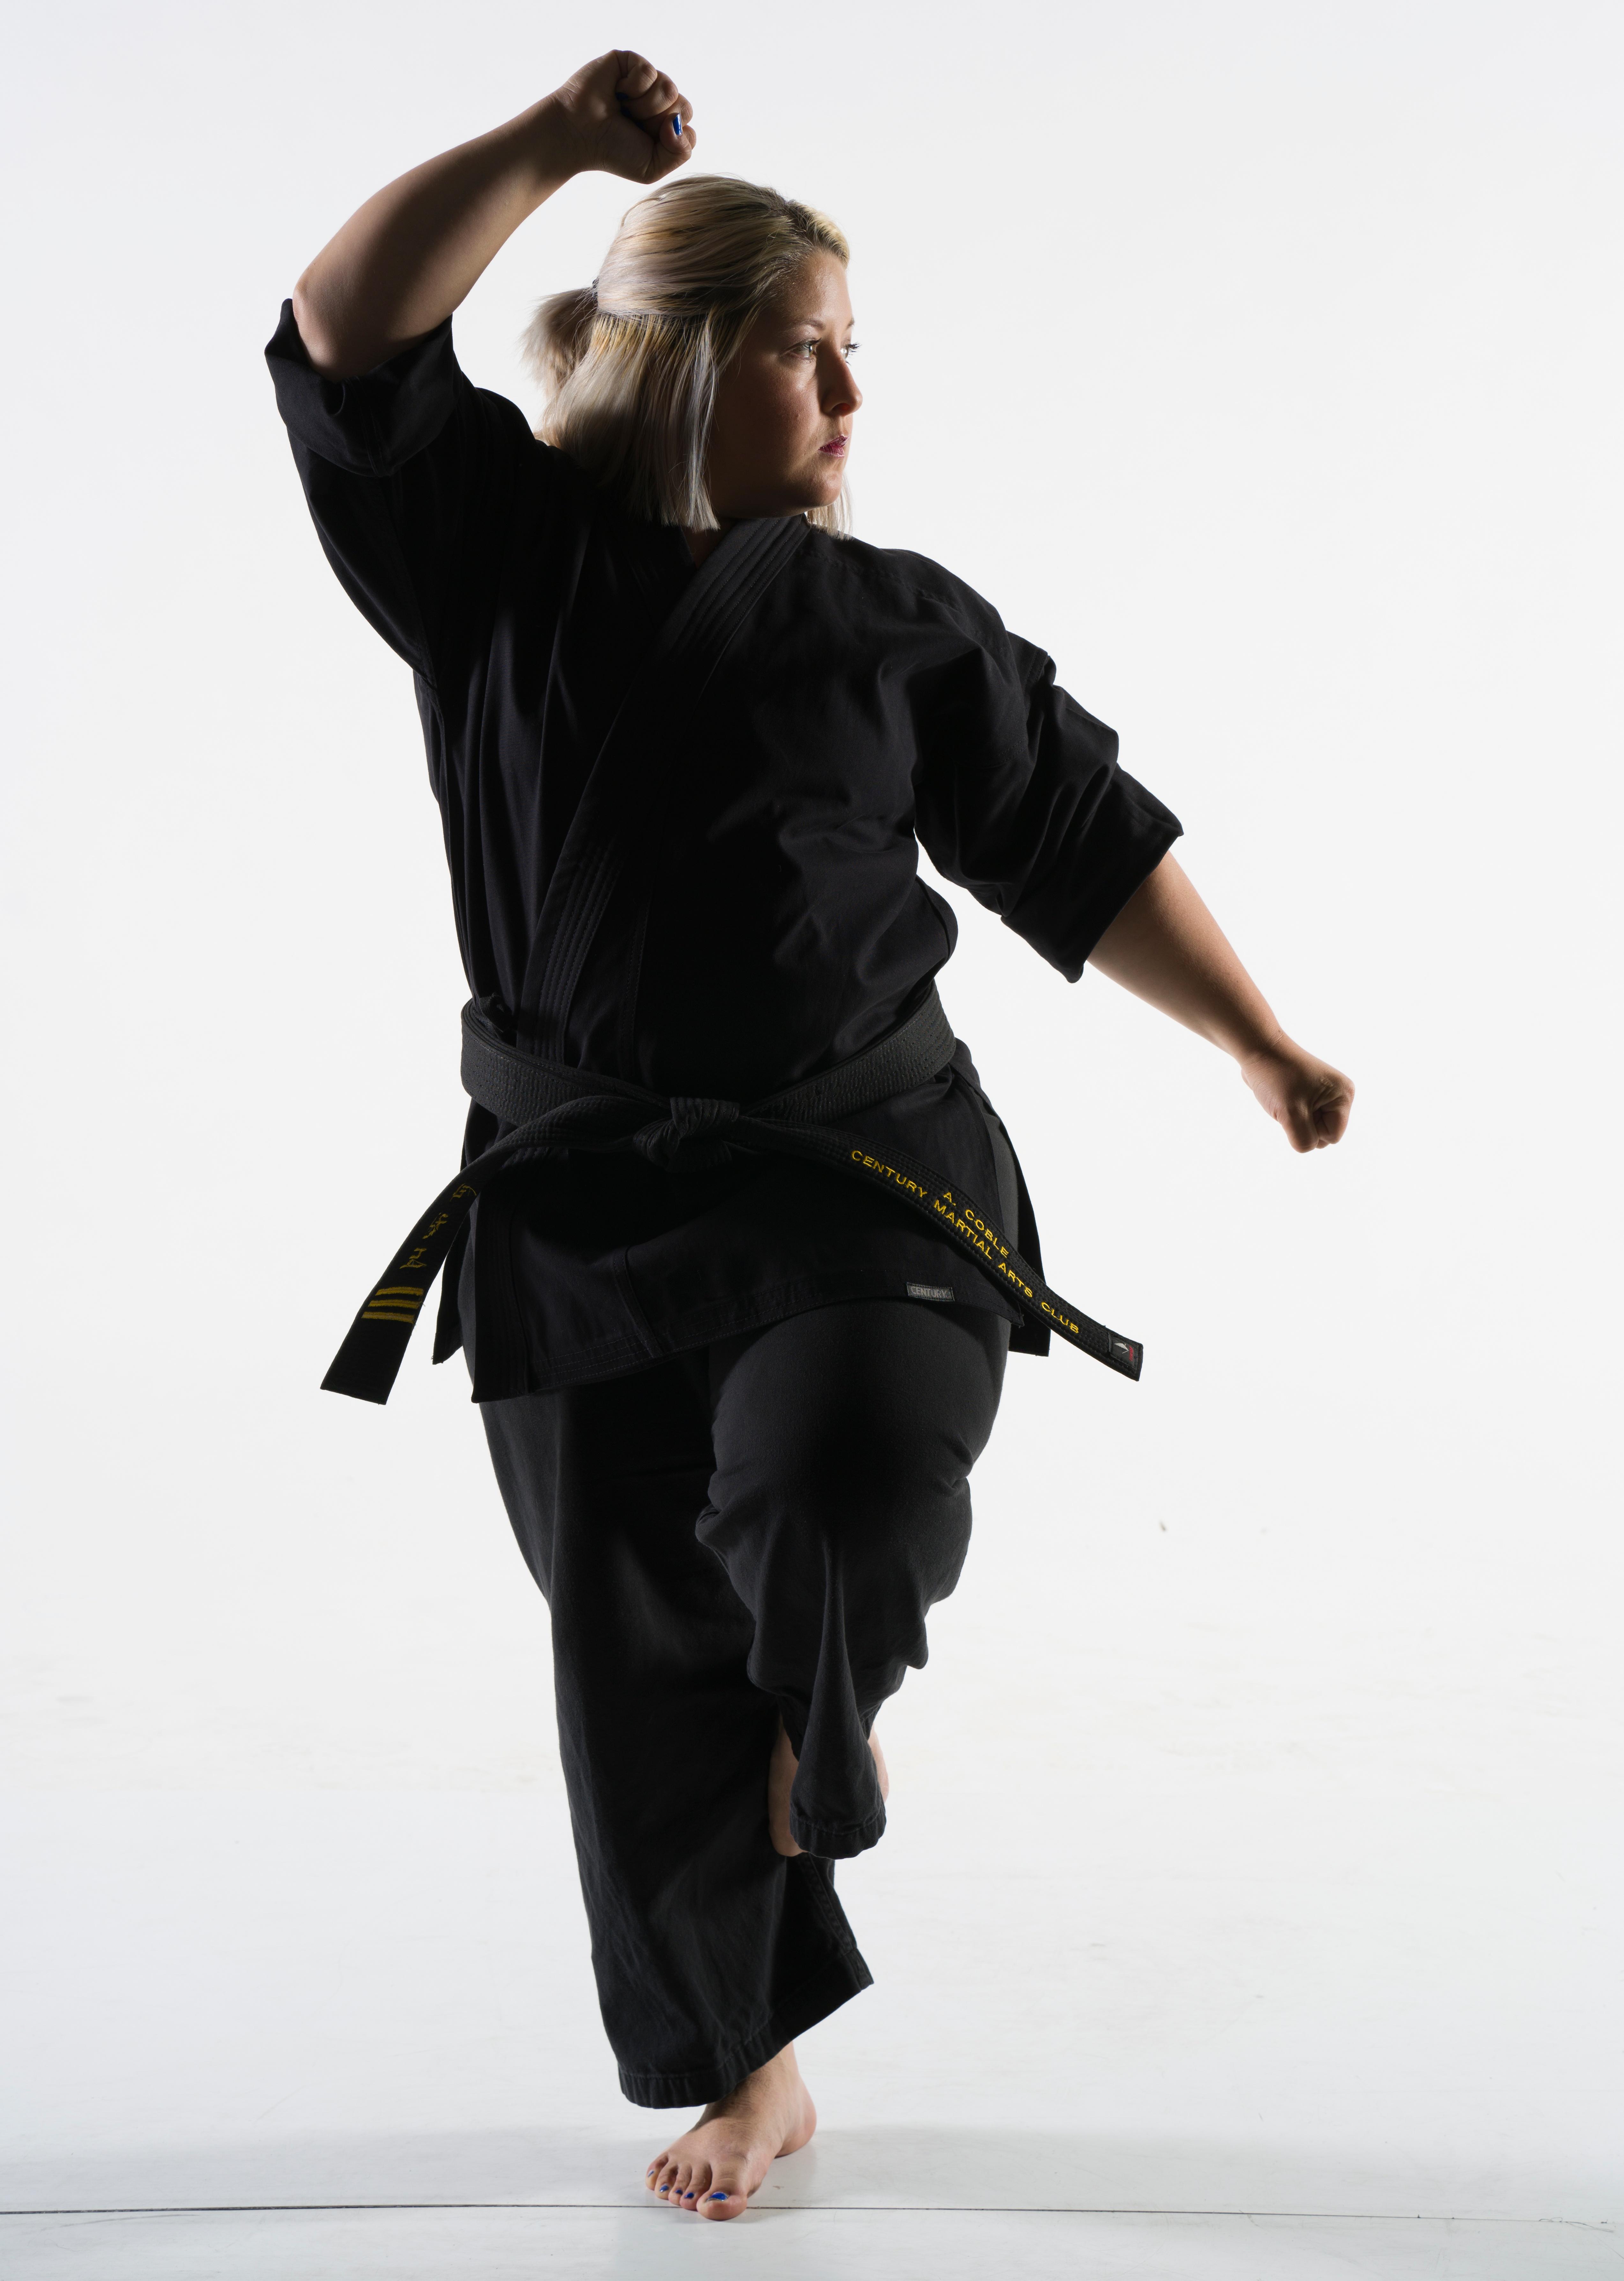 Amber Coble of Century Martial Arts is taekwondo black belt!